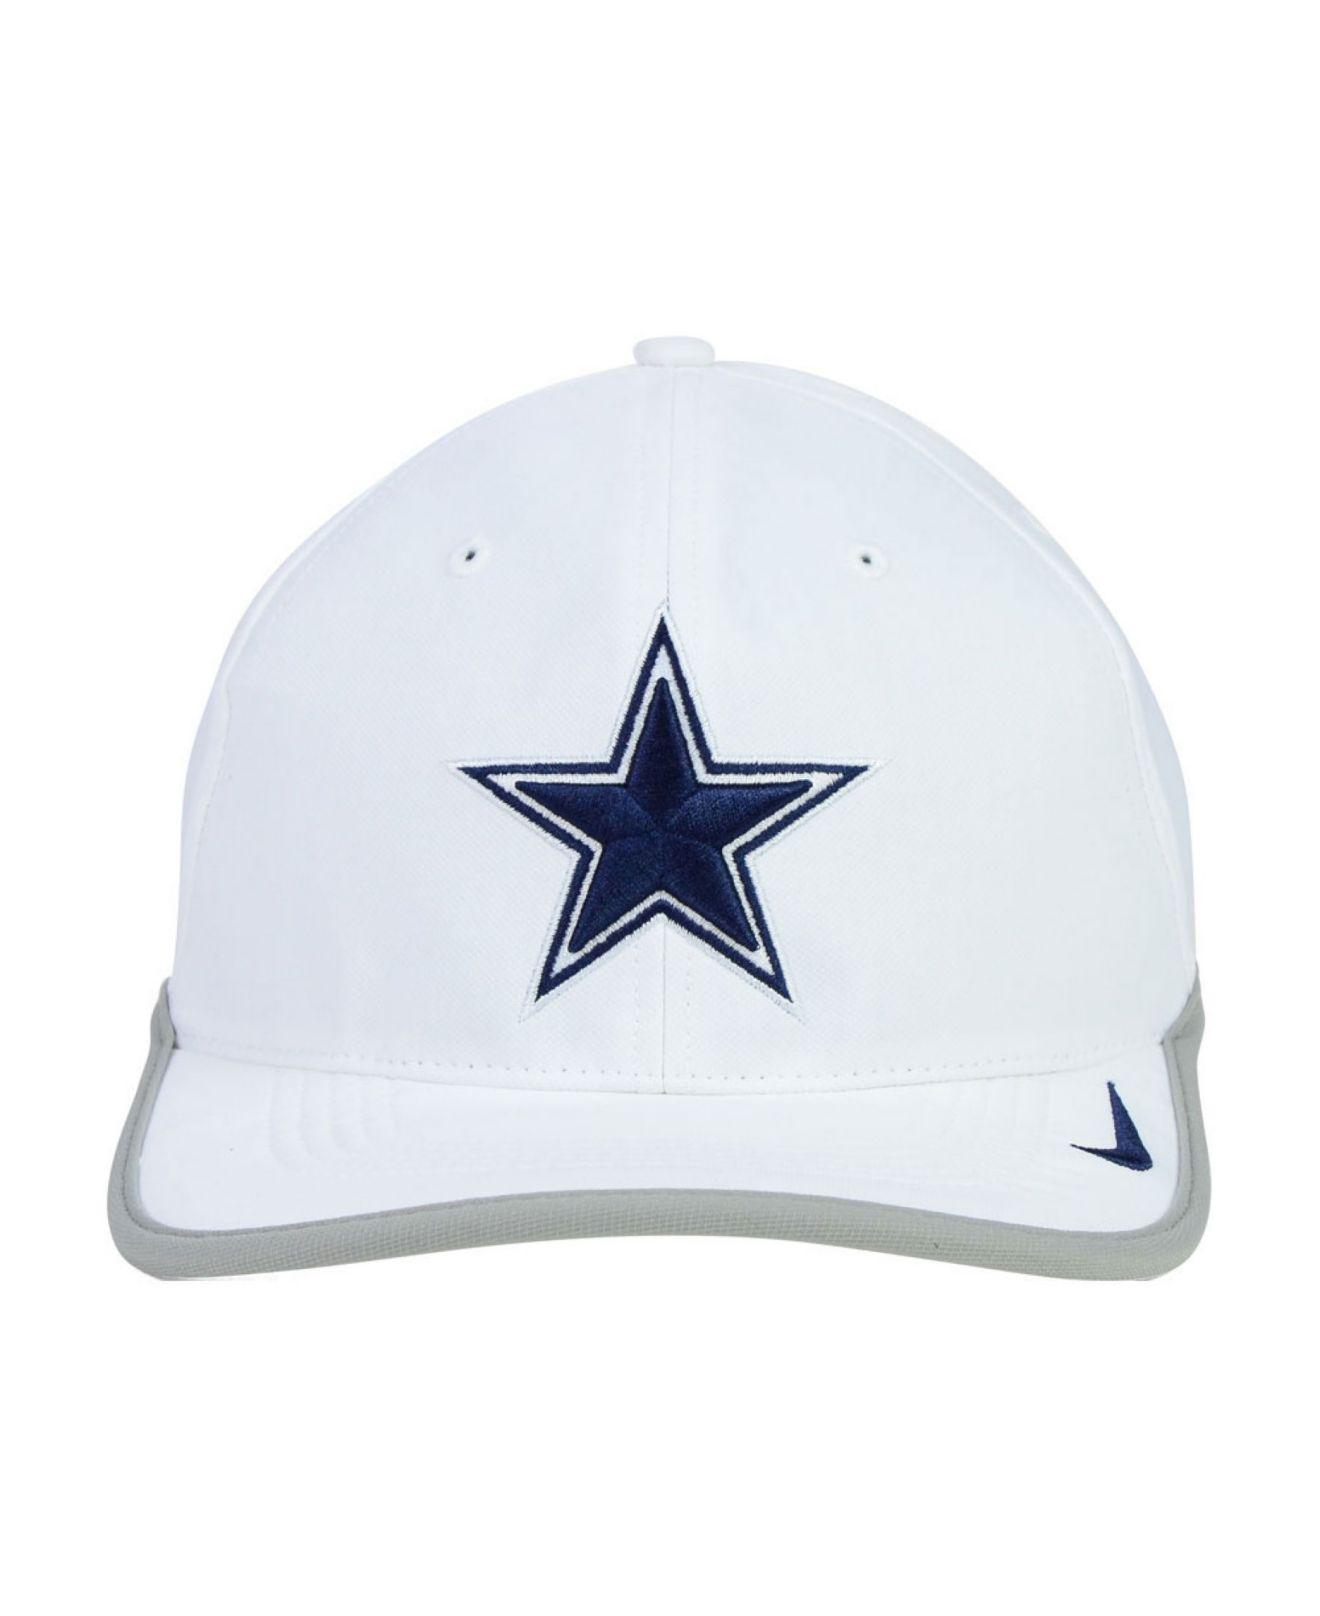 ... get lyst nike dallas cowboys legacy 91 dri fit cap in white 9890d 29cc8 1a6f15187675